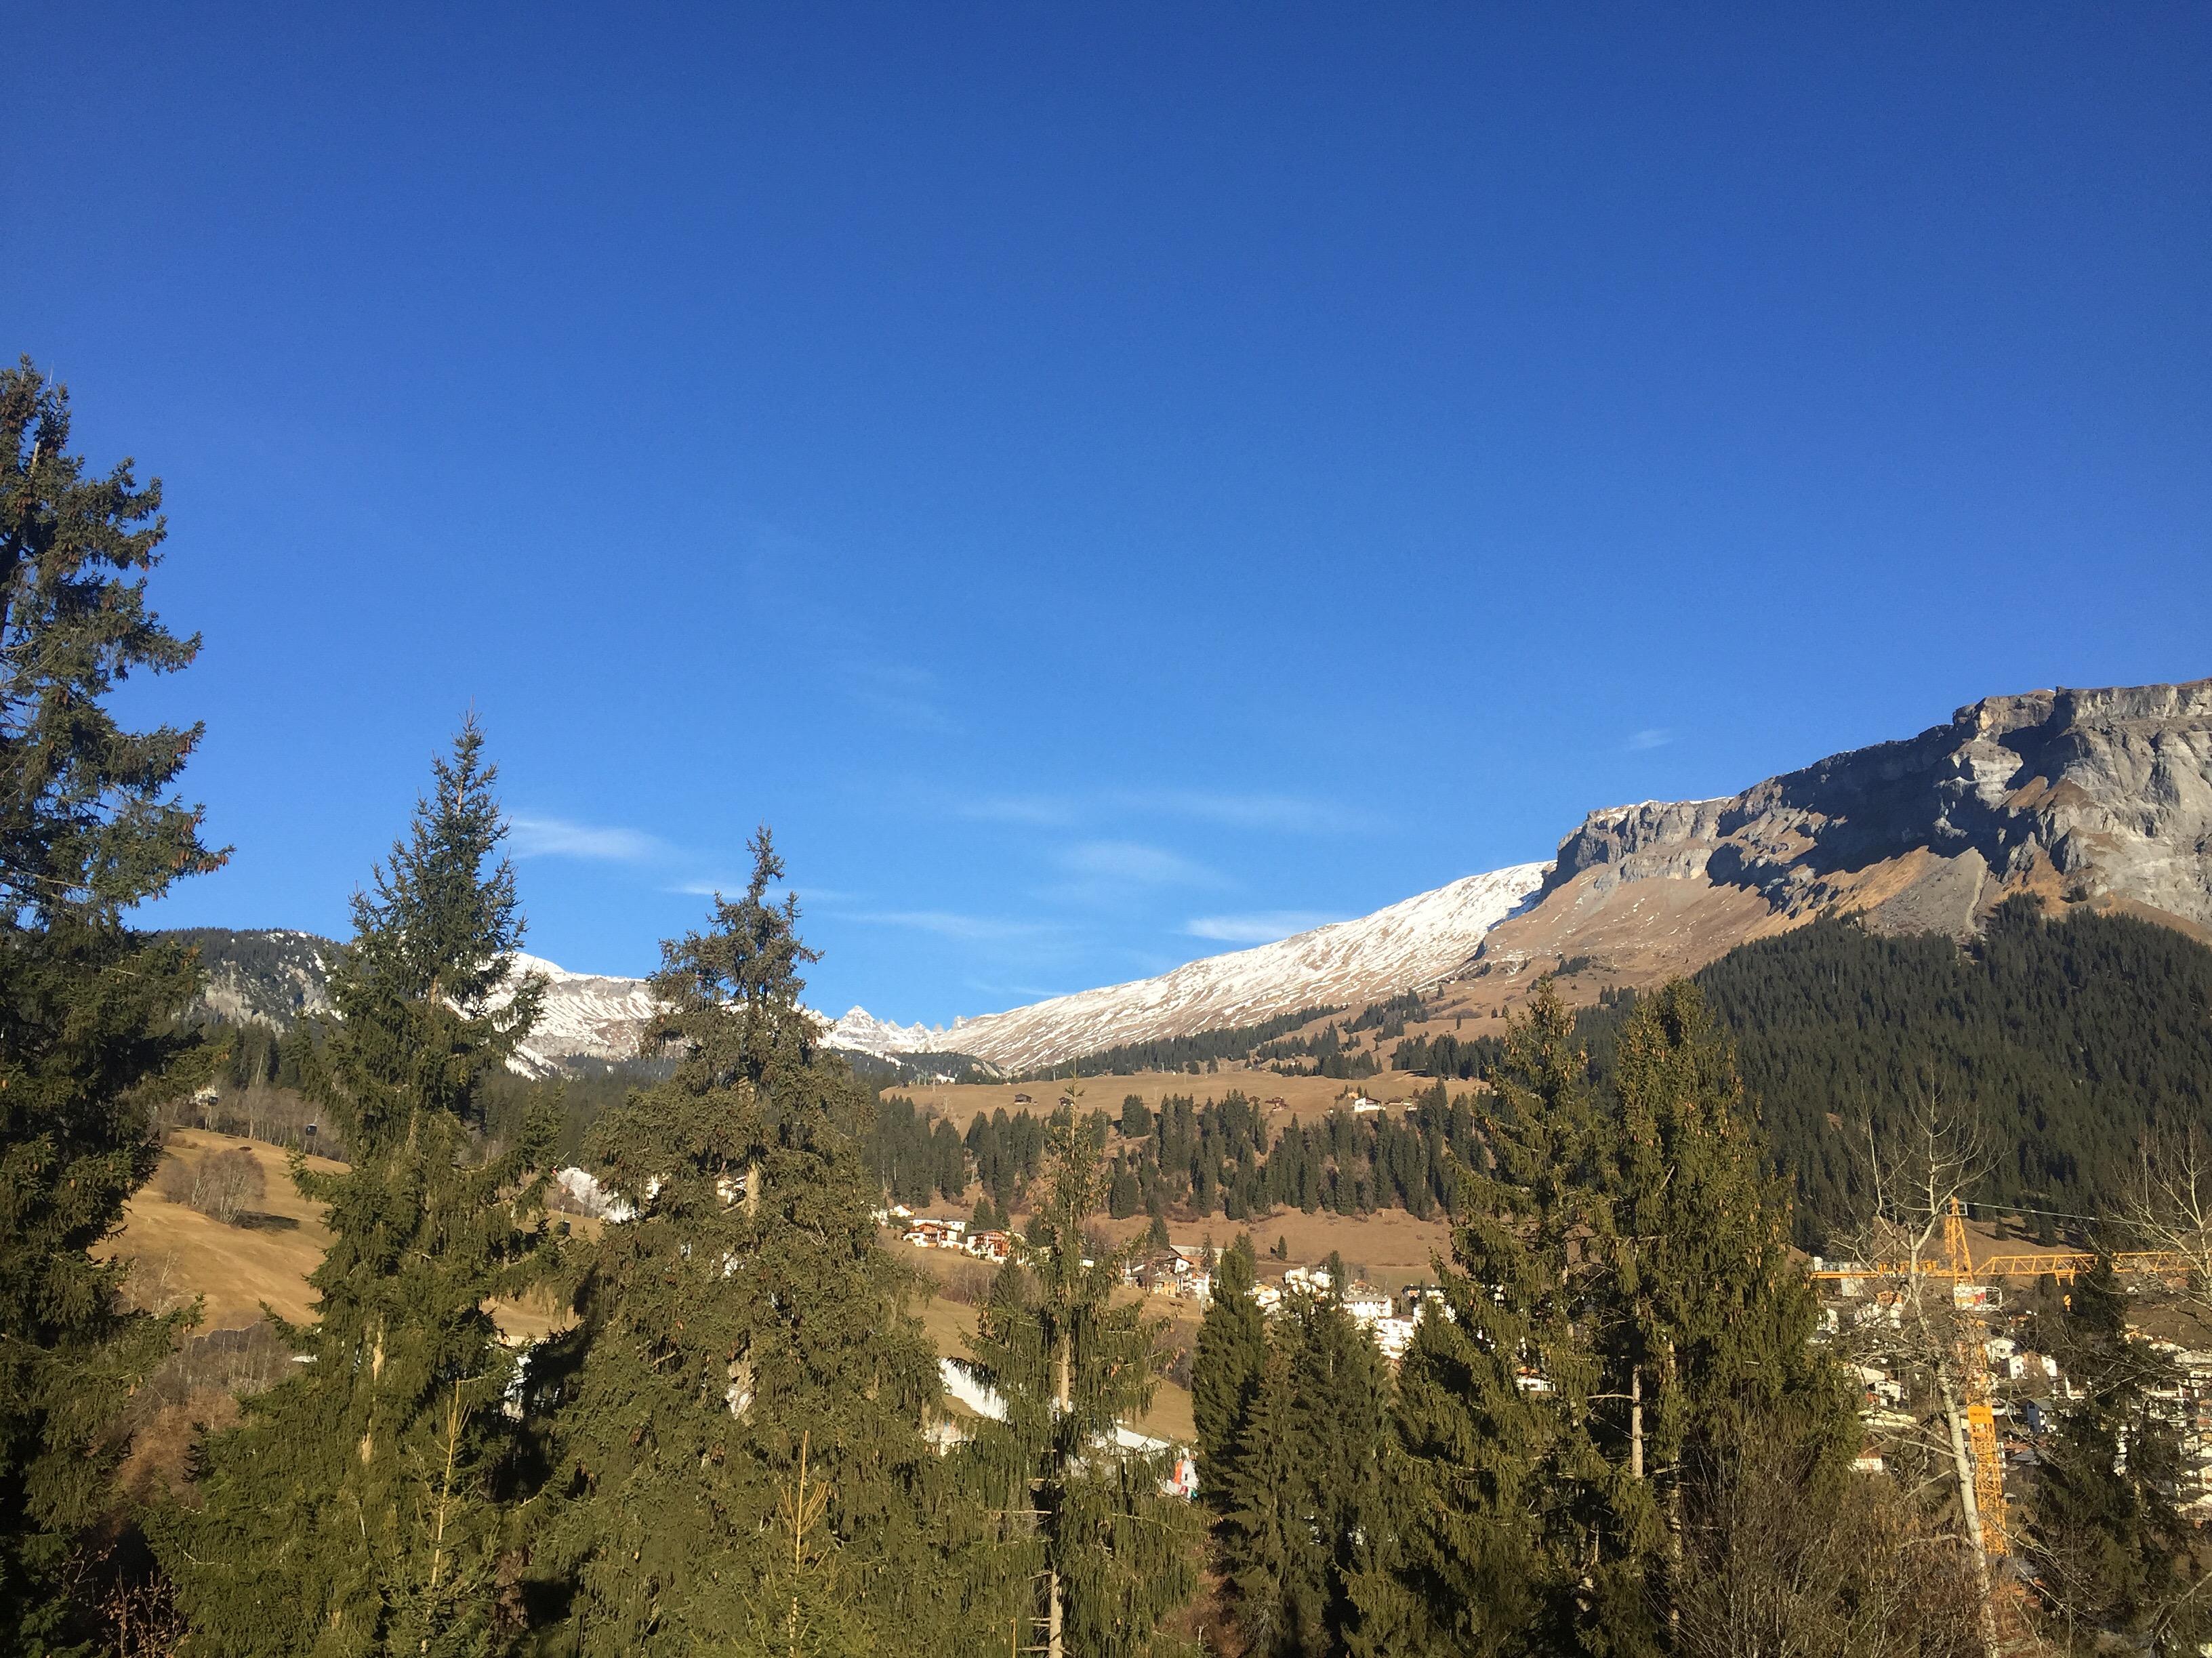 Dream of snowy Swiss Alps